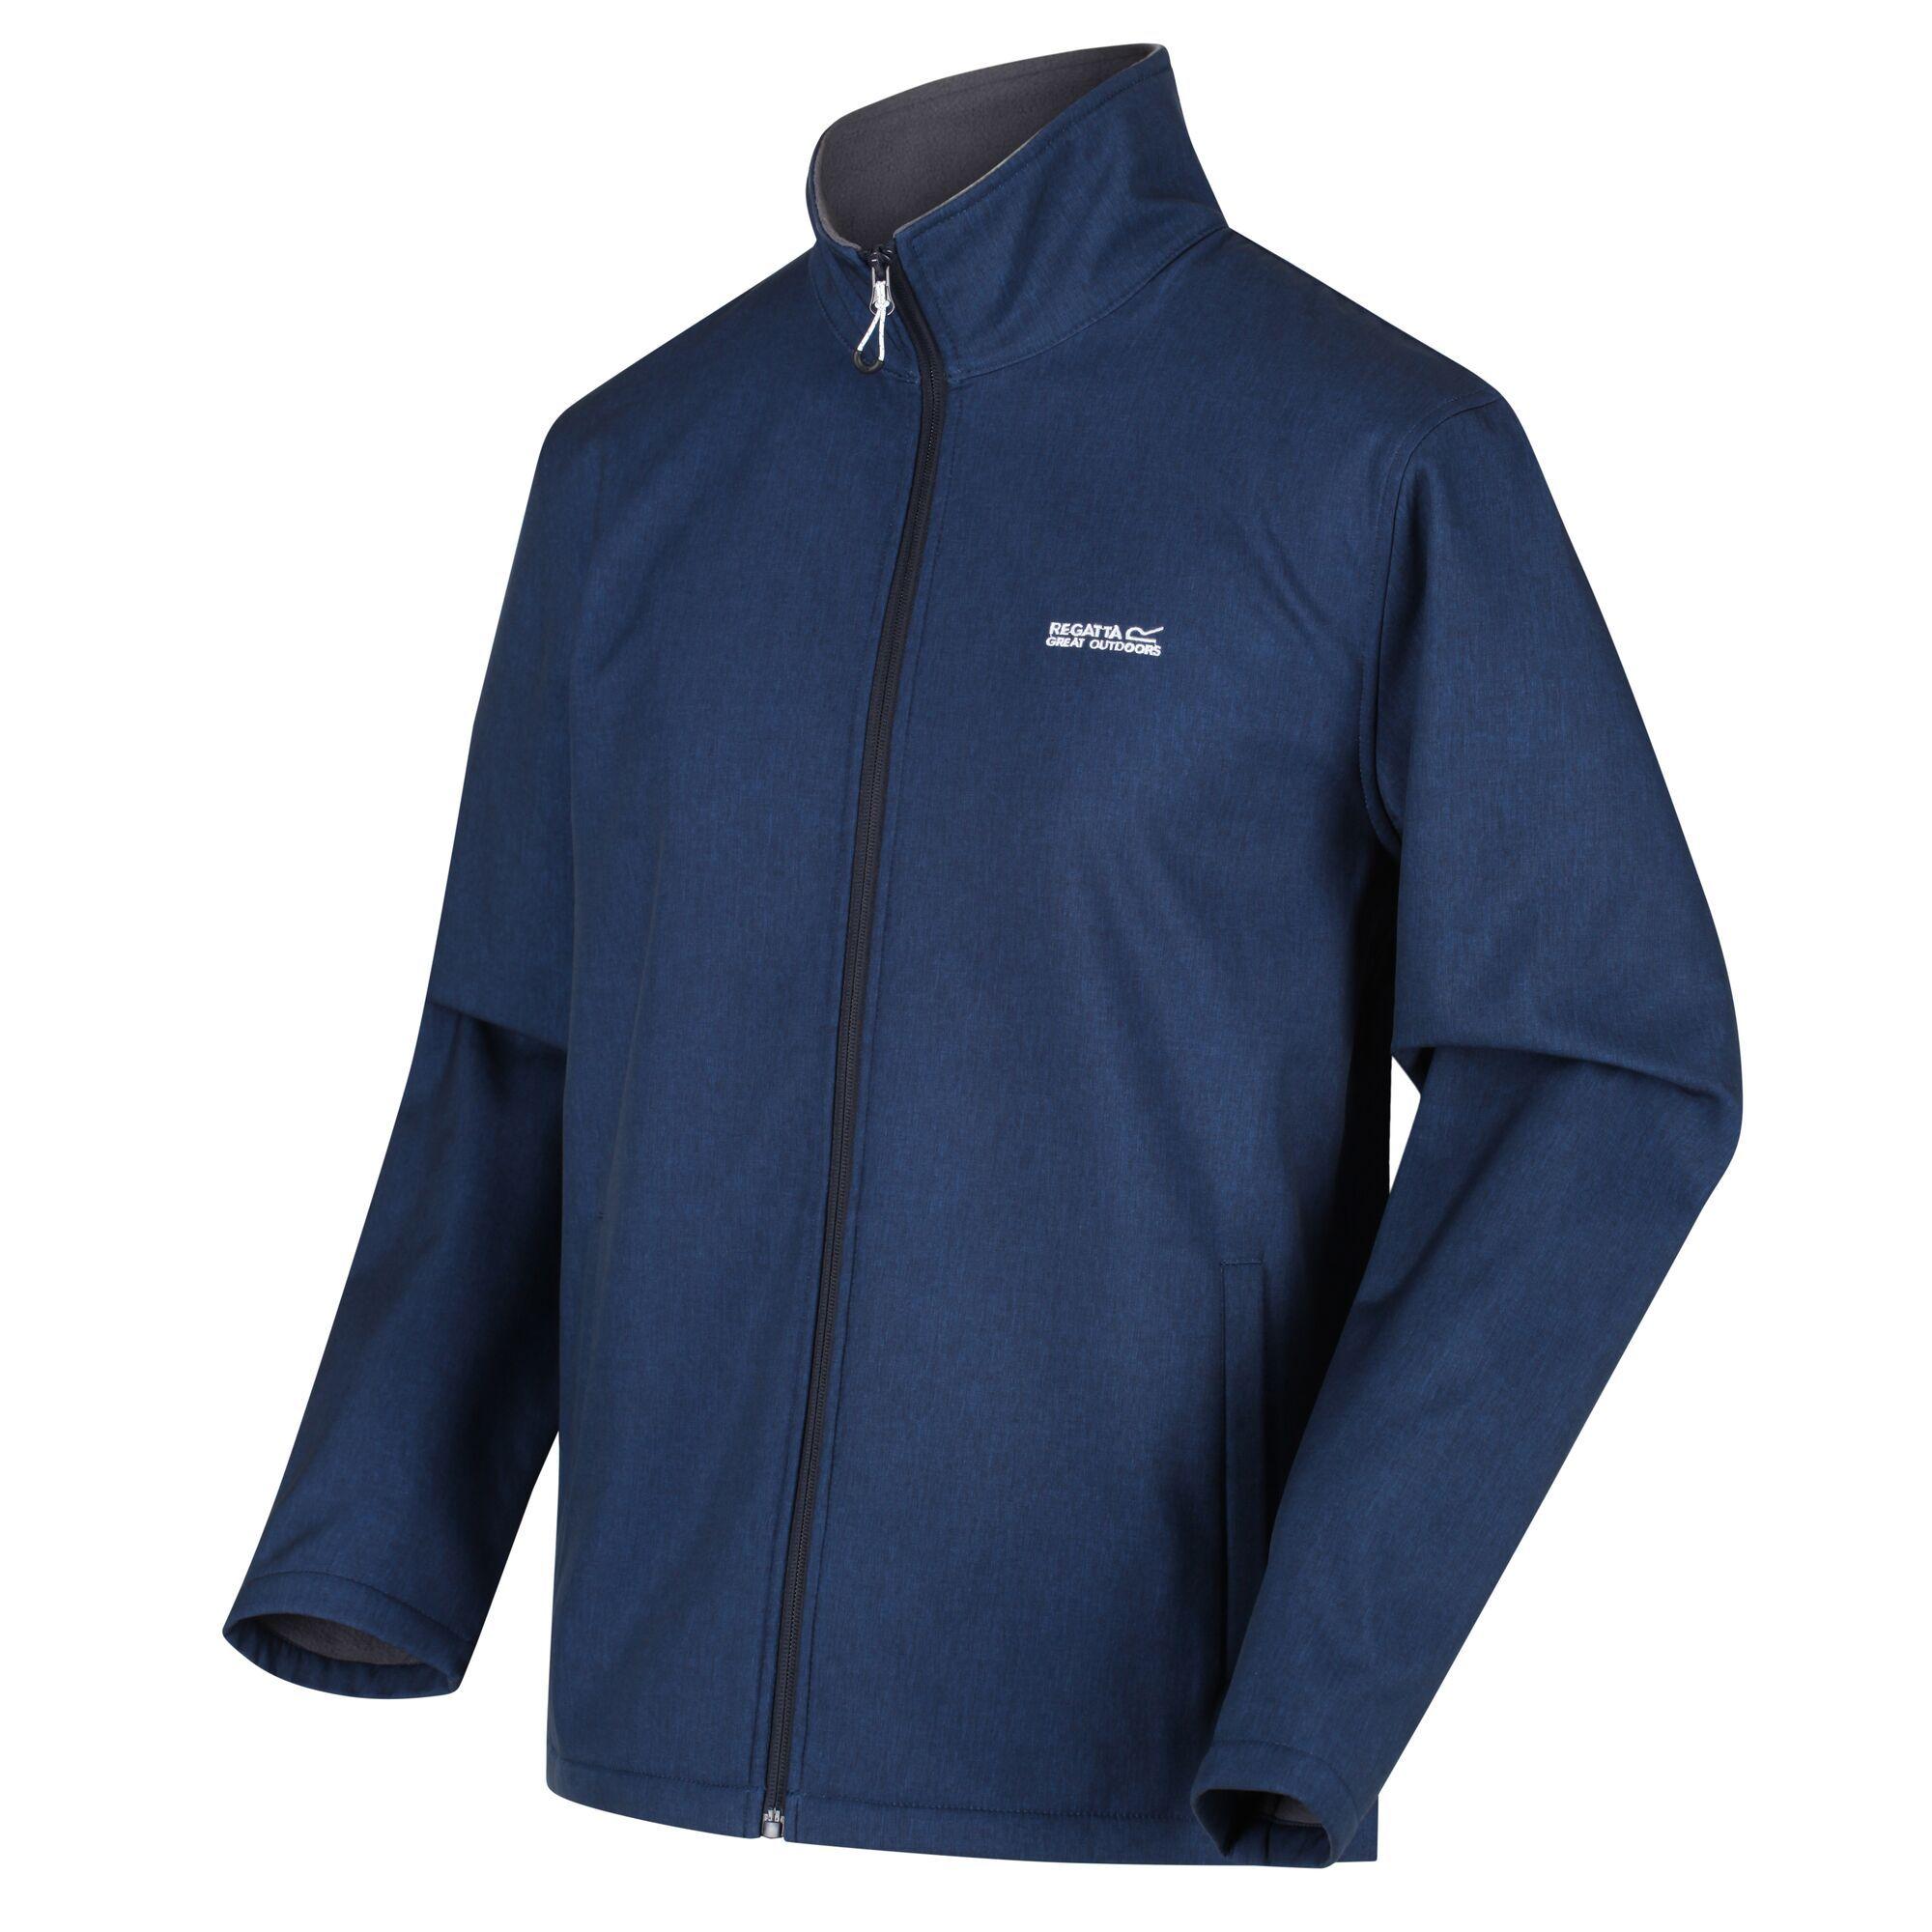 Shop Men's Softshell Jackets